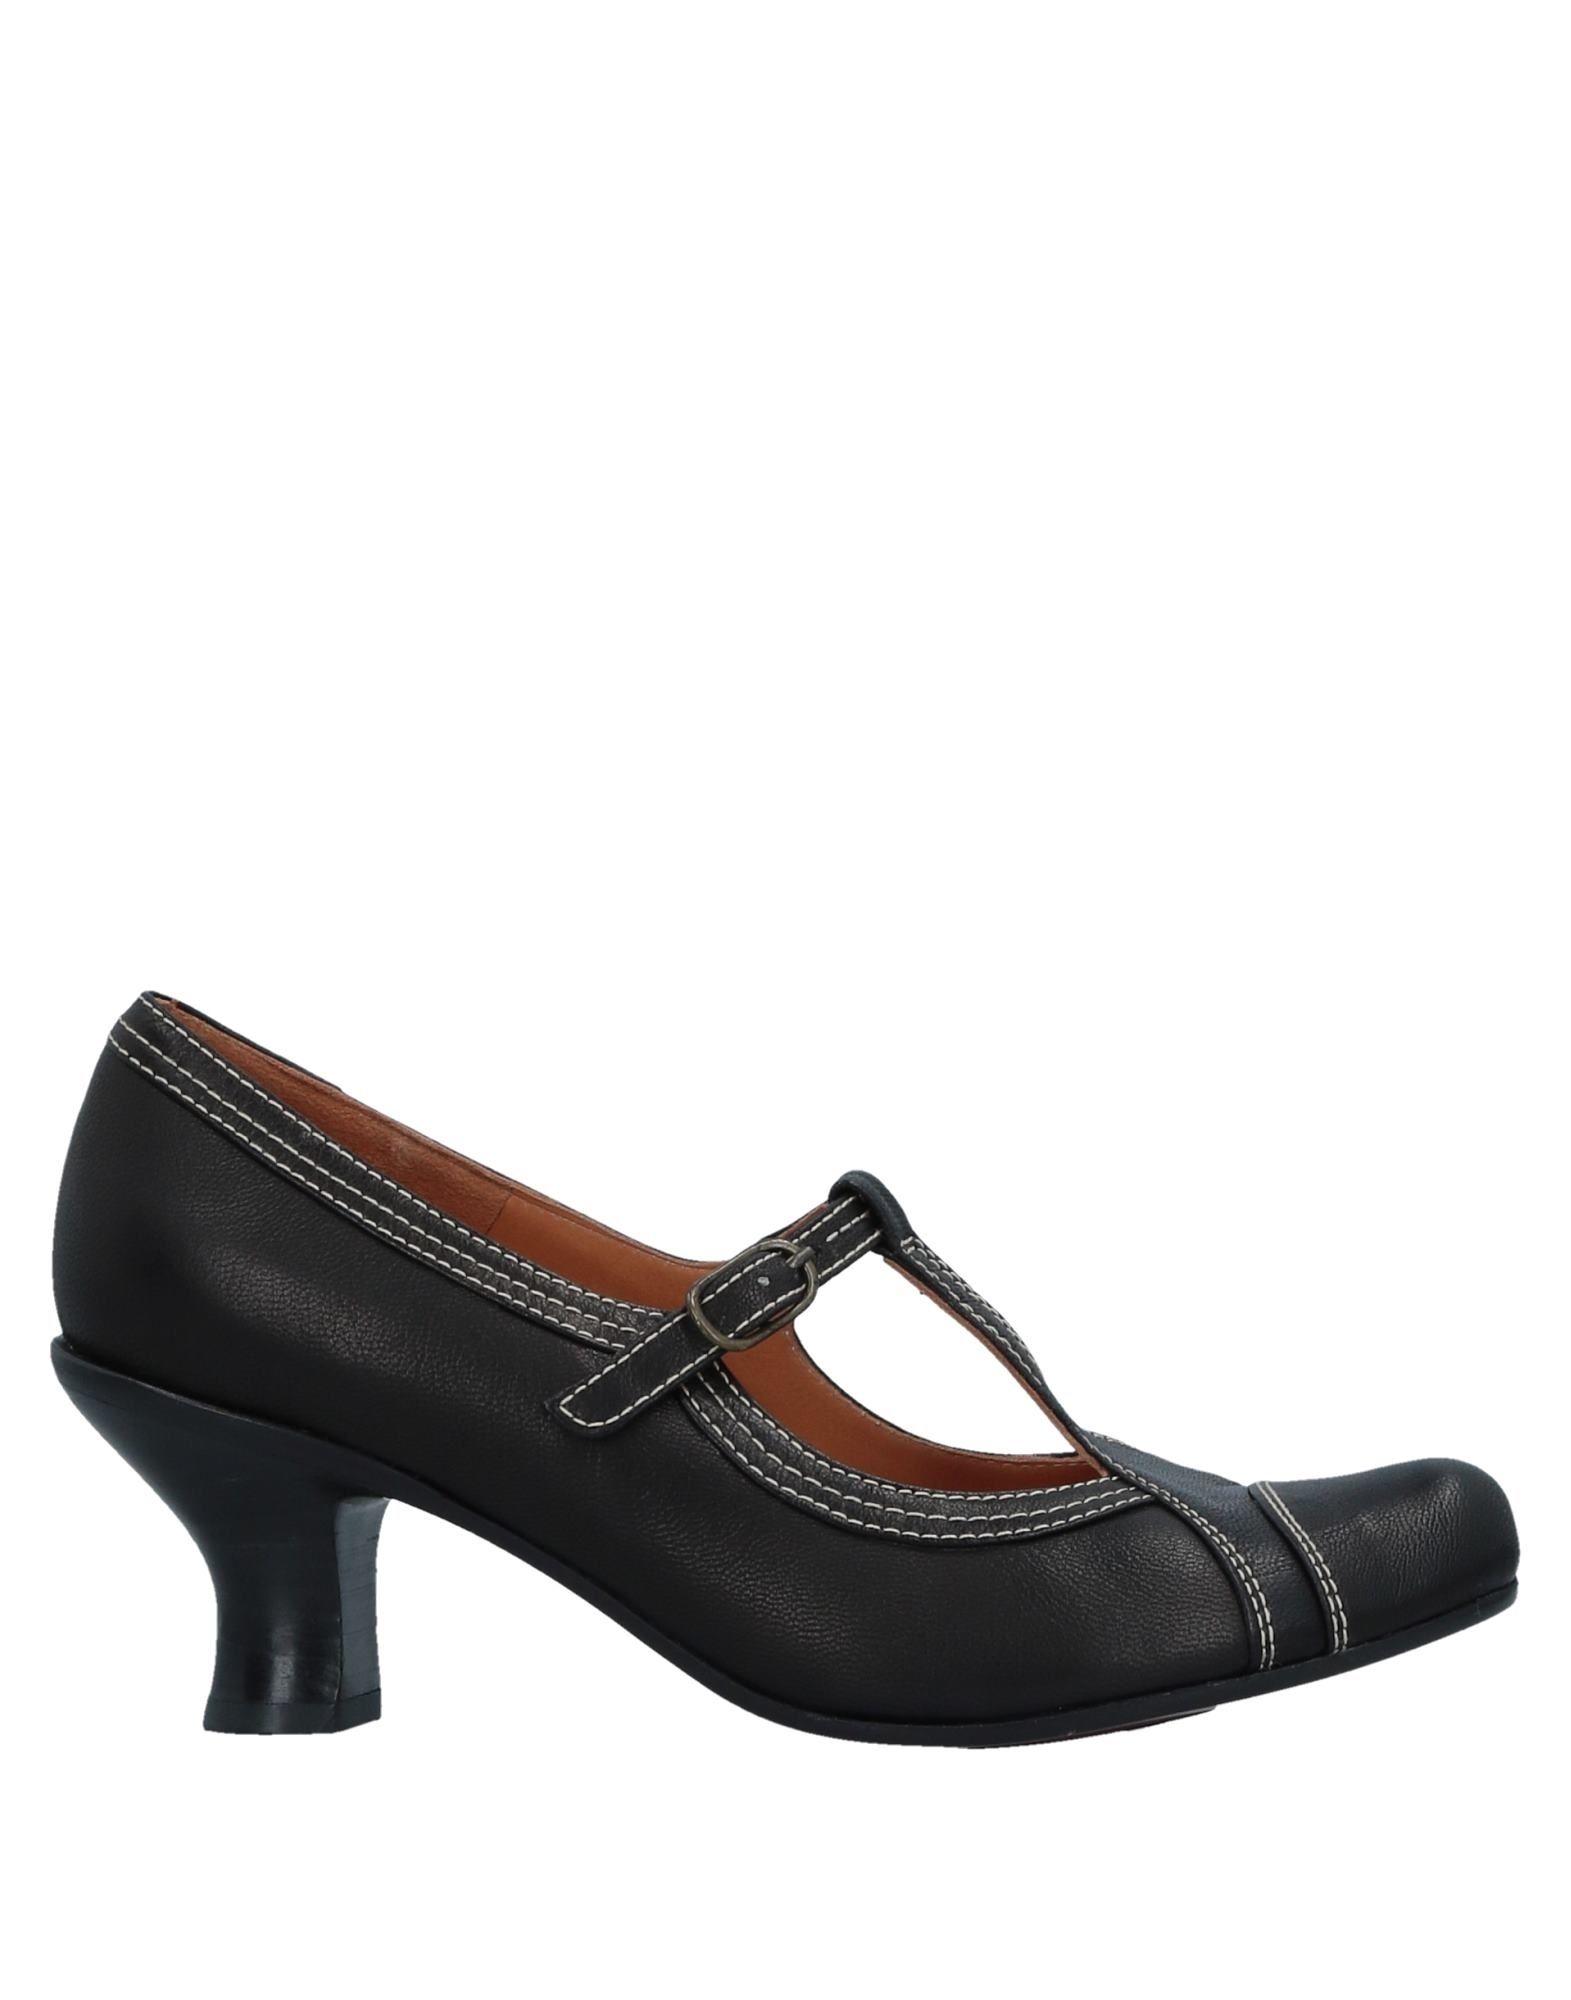 Stilvolle billige Pumps Schuhe Chie Mihara Pumps billige Damen  11522316MG b641fb